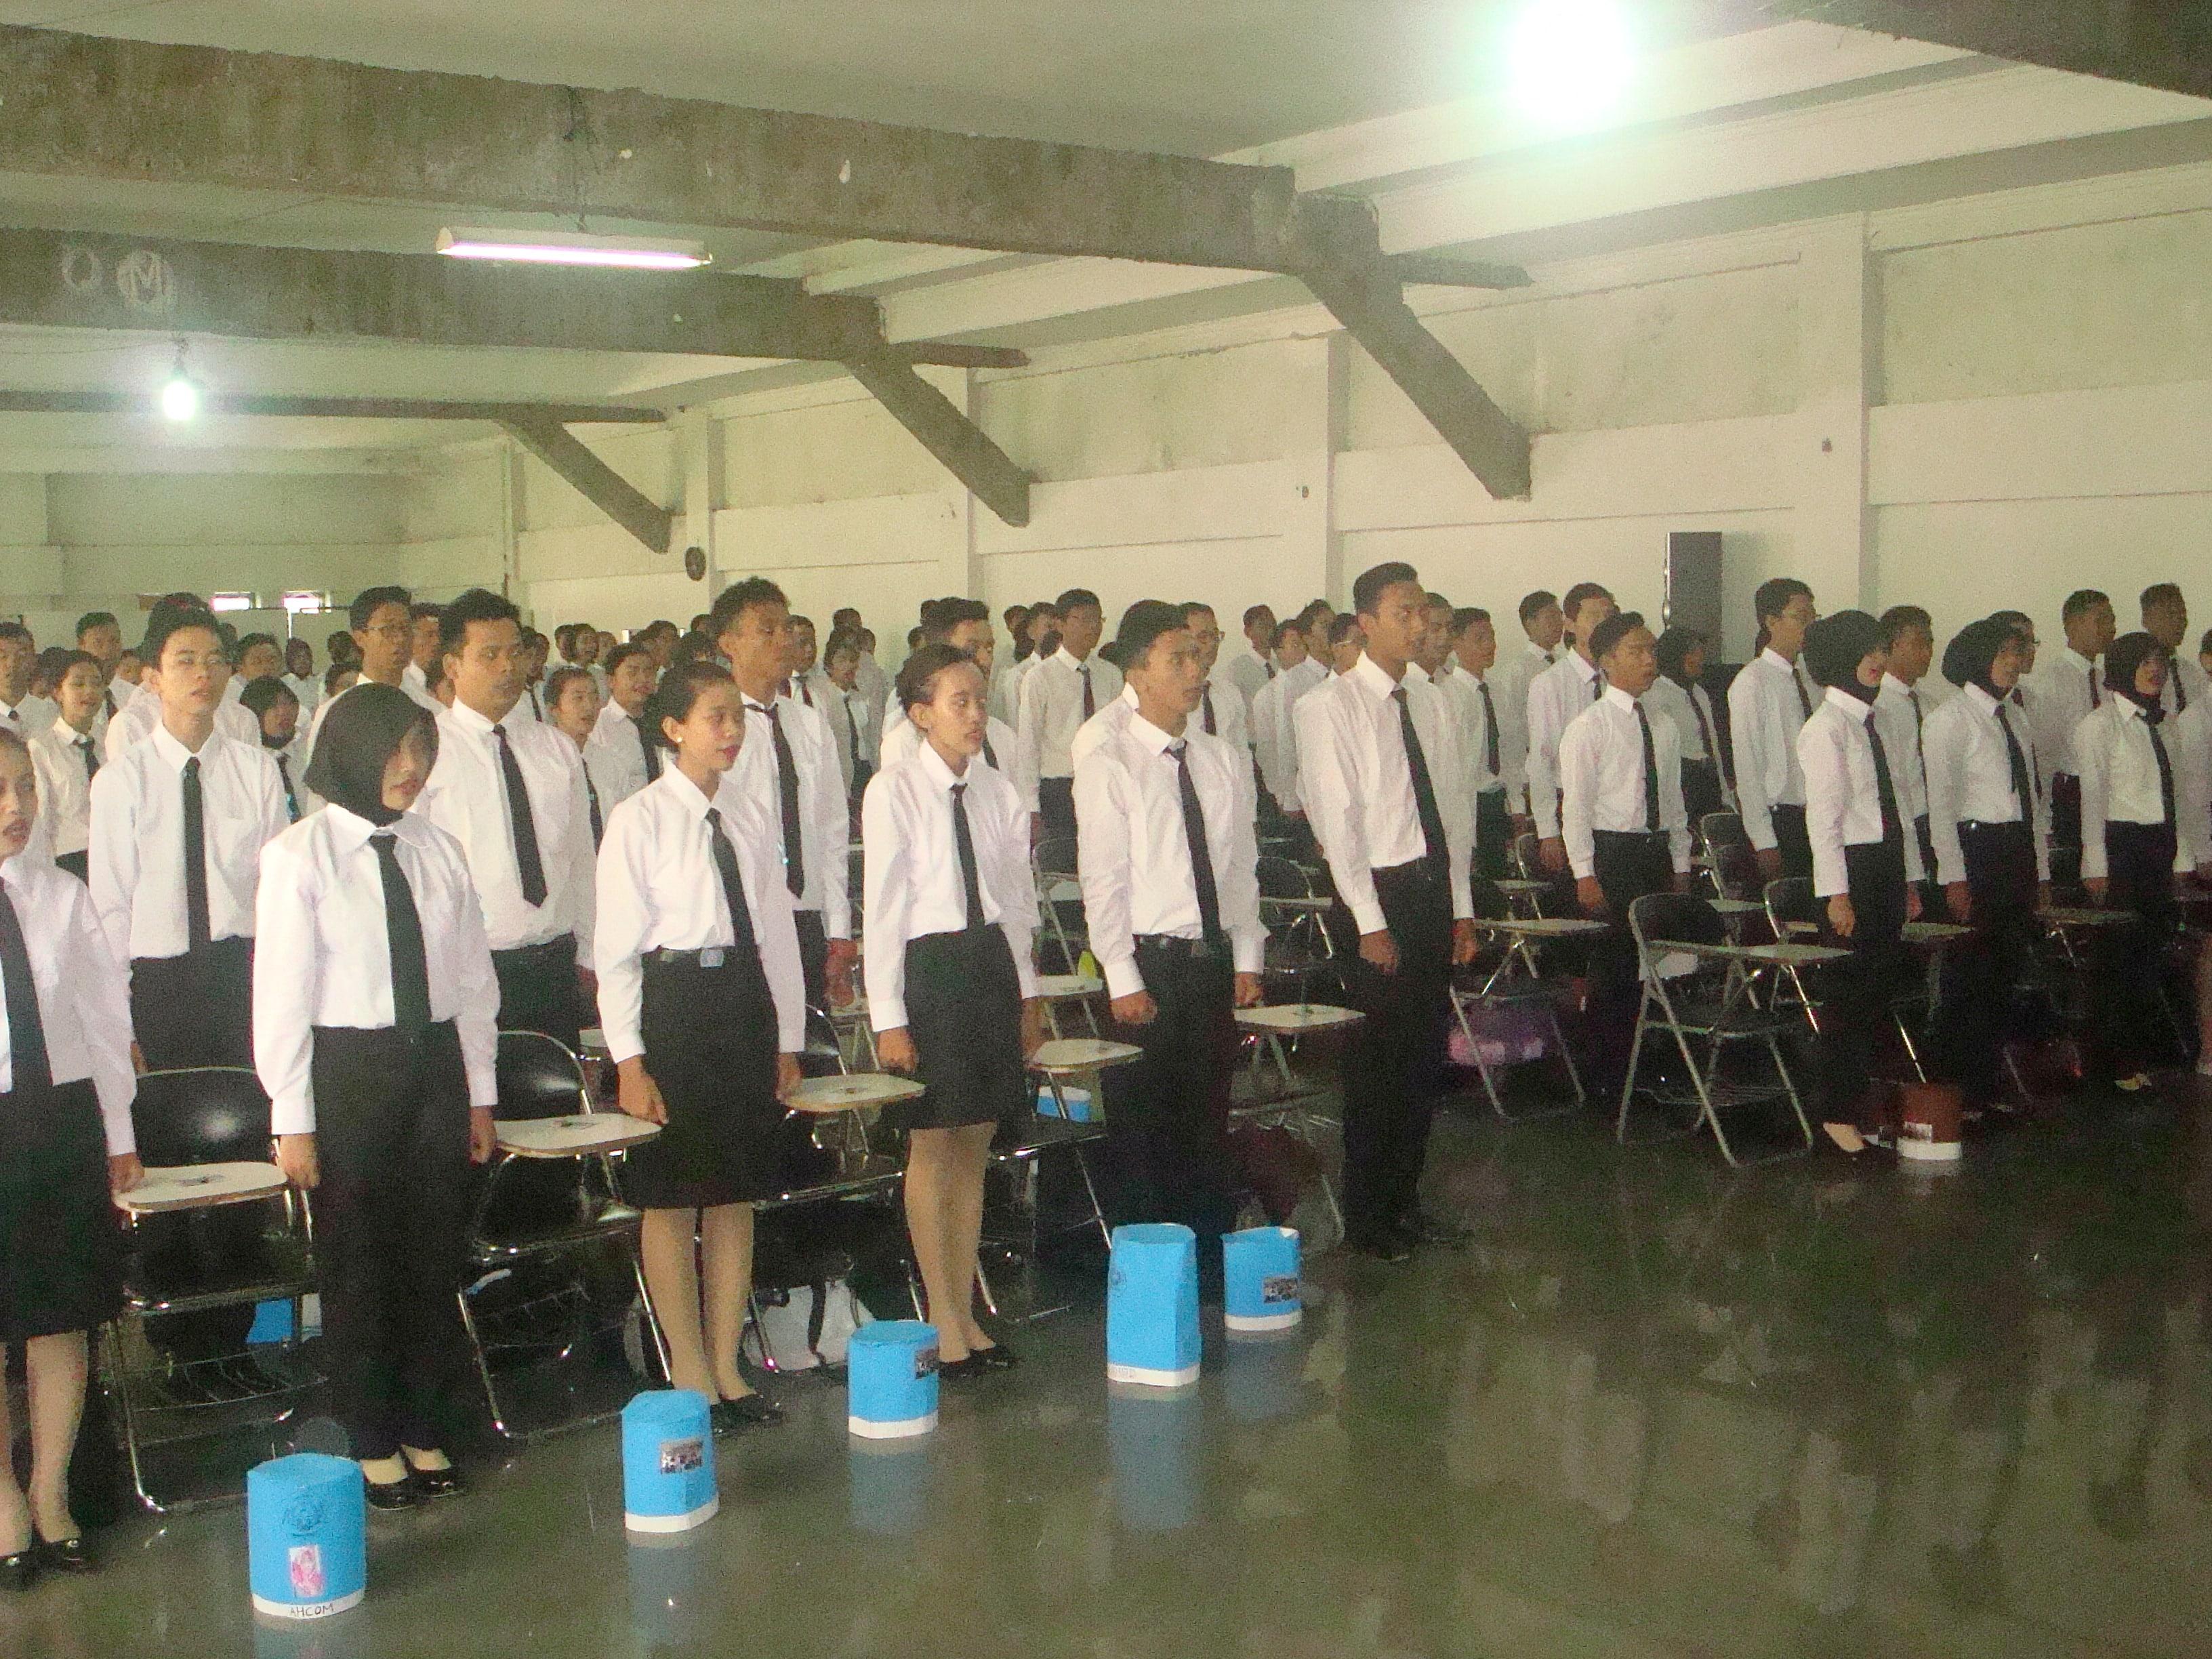 Pembukaan Pendaftaran Akademi Pariwisata Eka Sakti - ujiansma.com